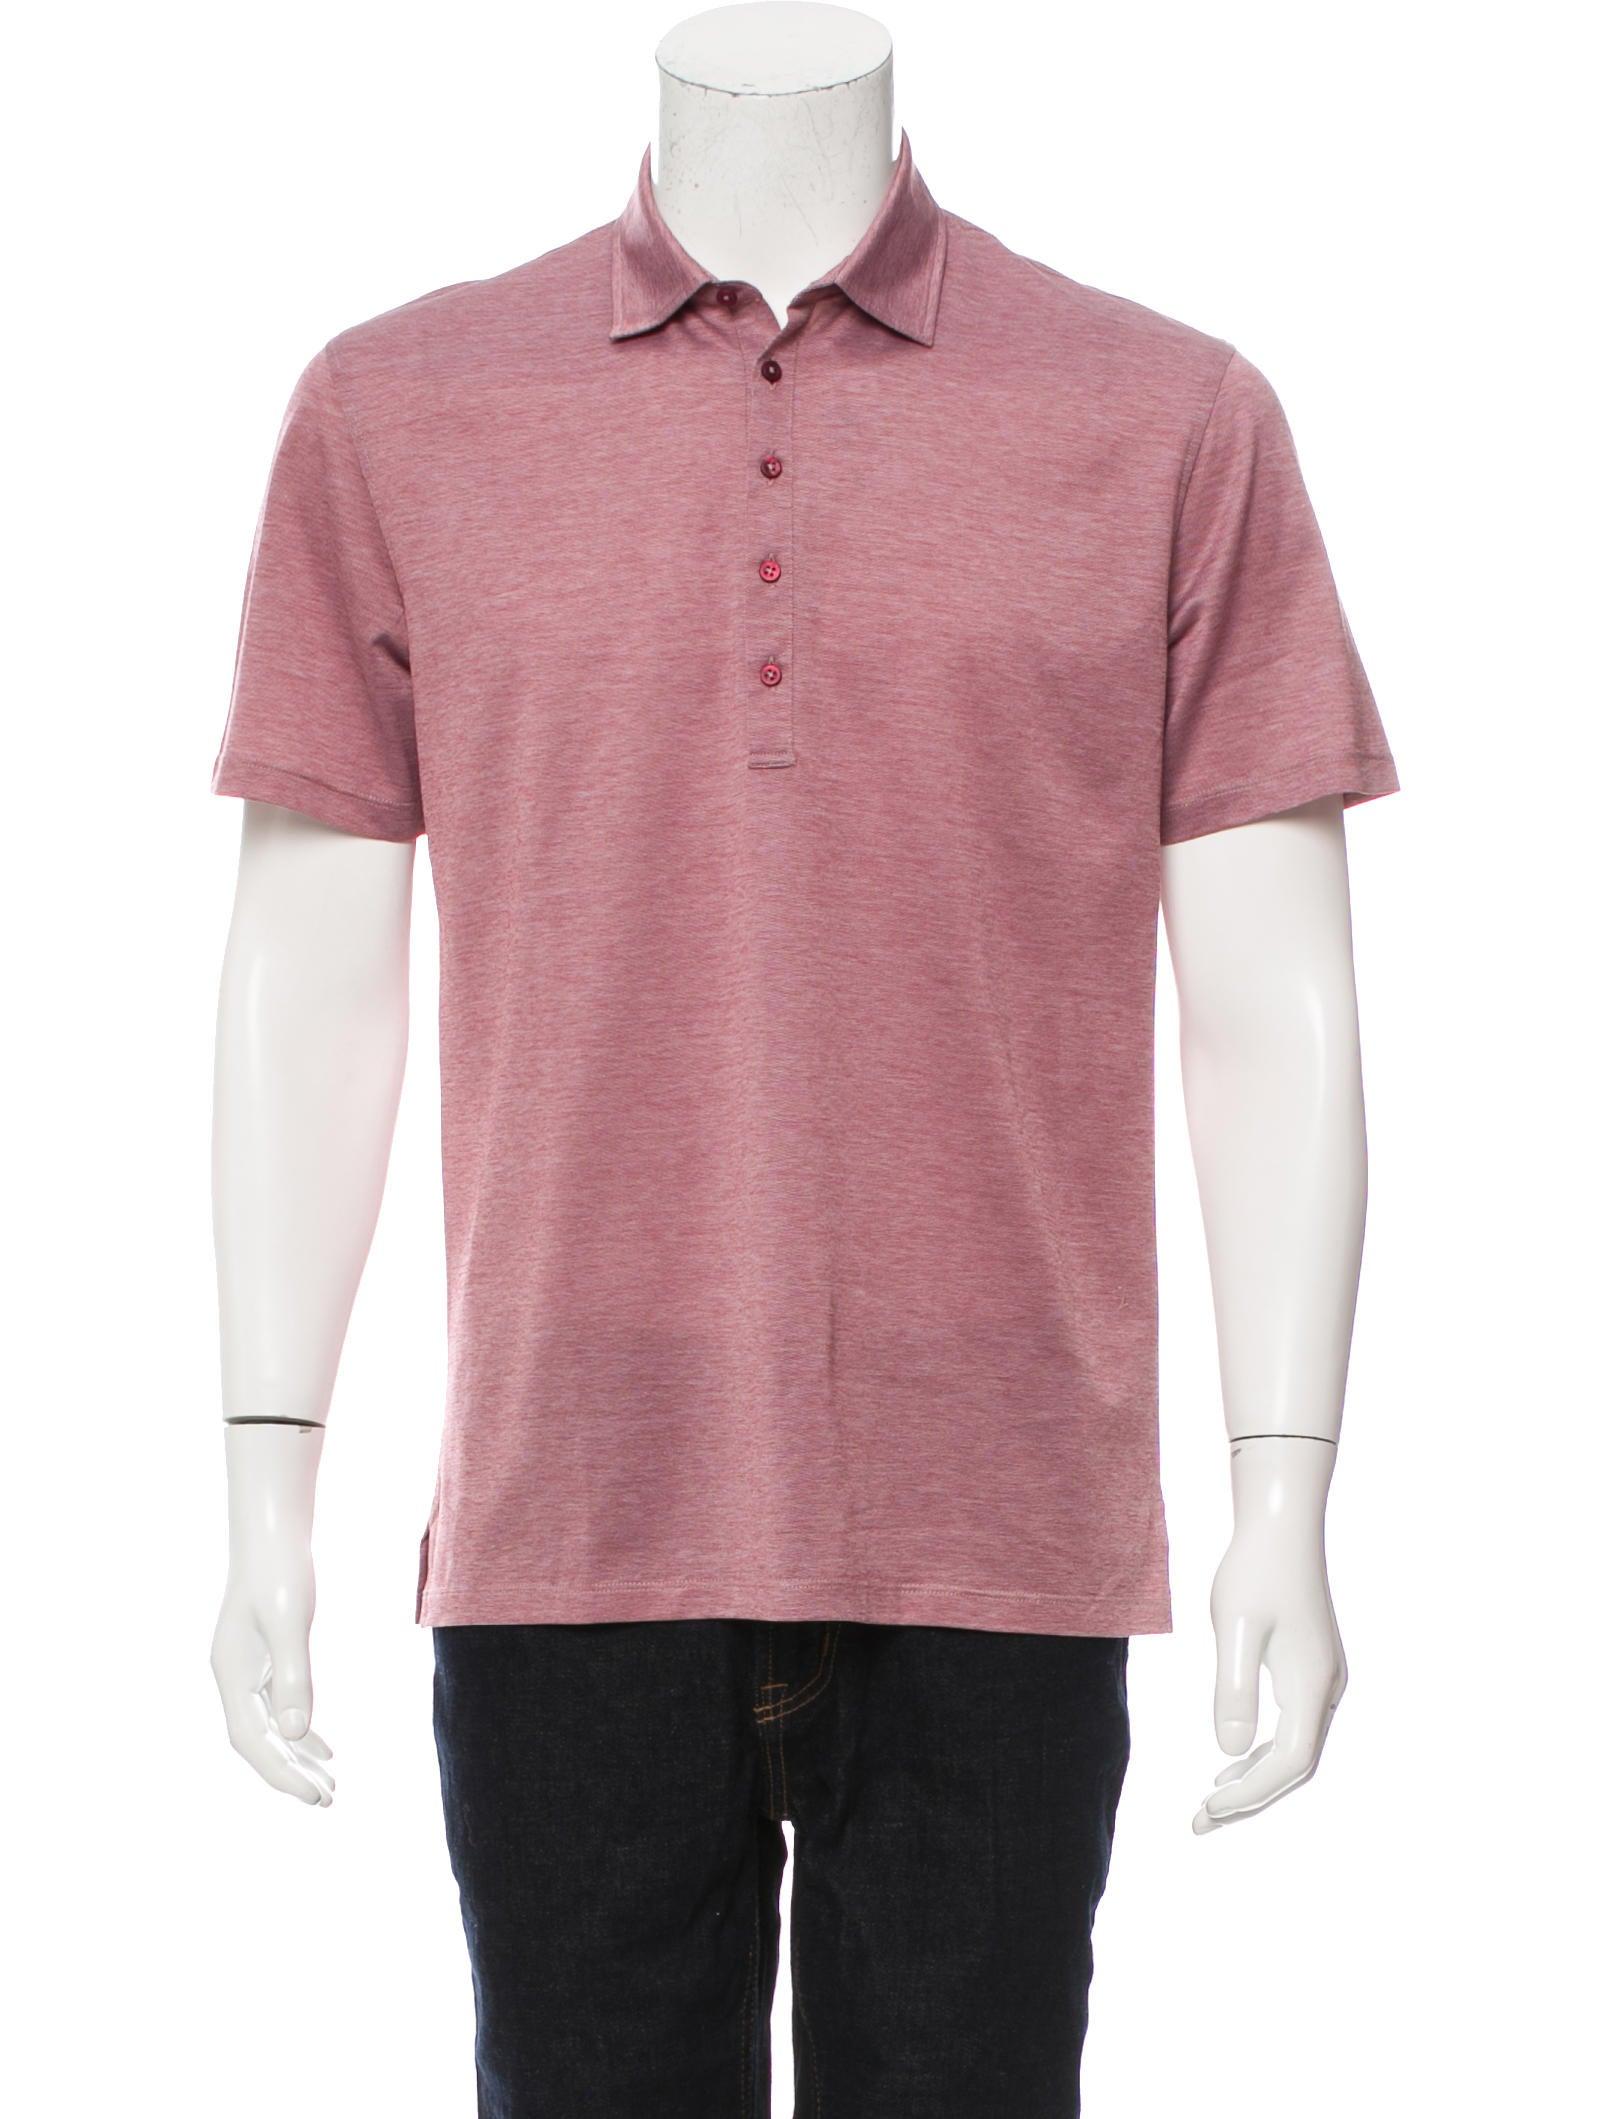 Ermenegildo zegna knit polo shirt w tags clothing for Zegna polo shirts sale